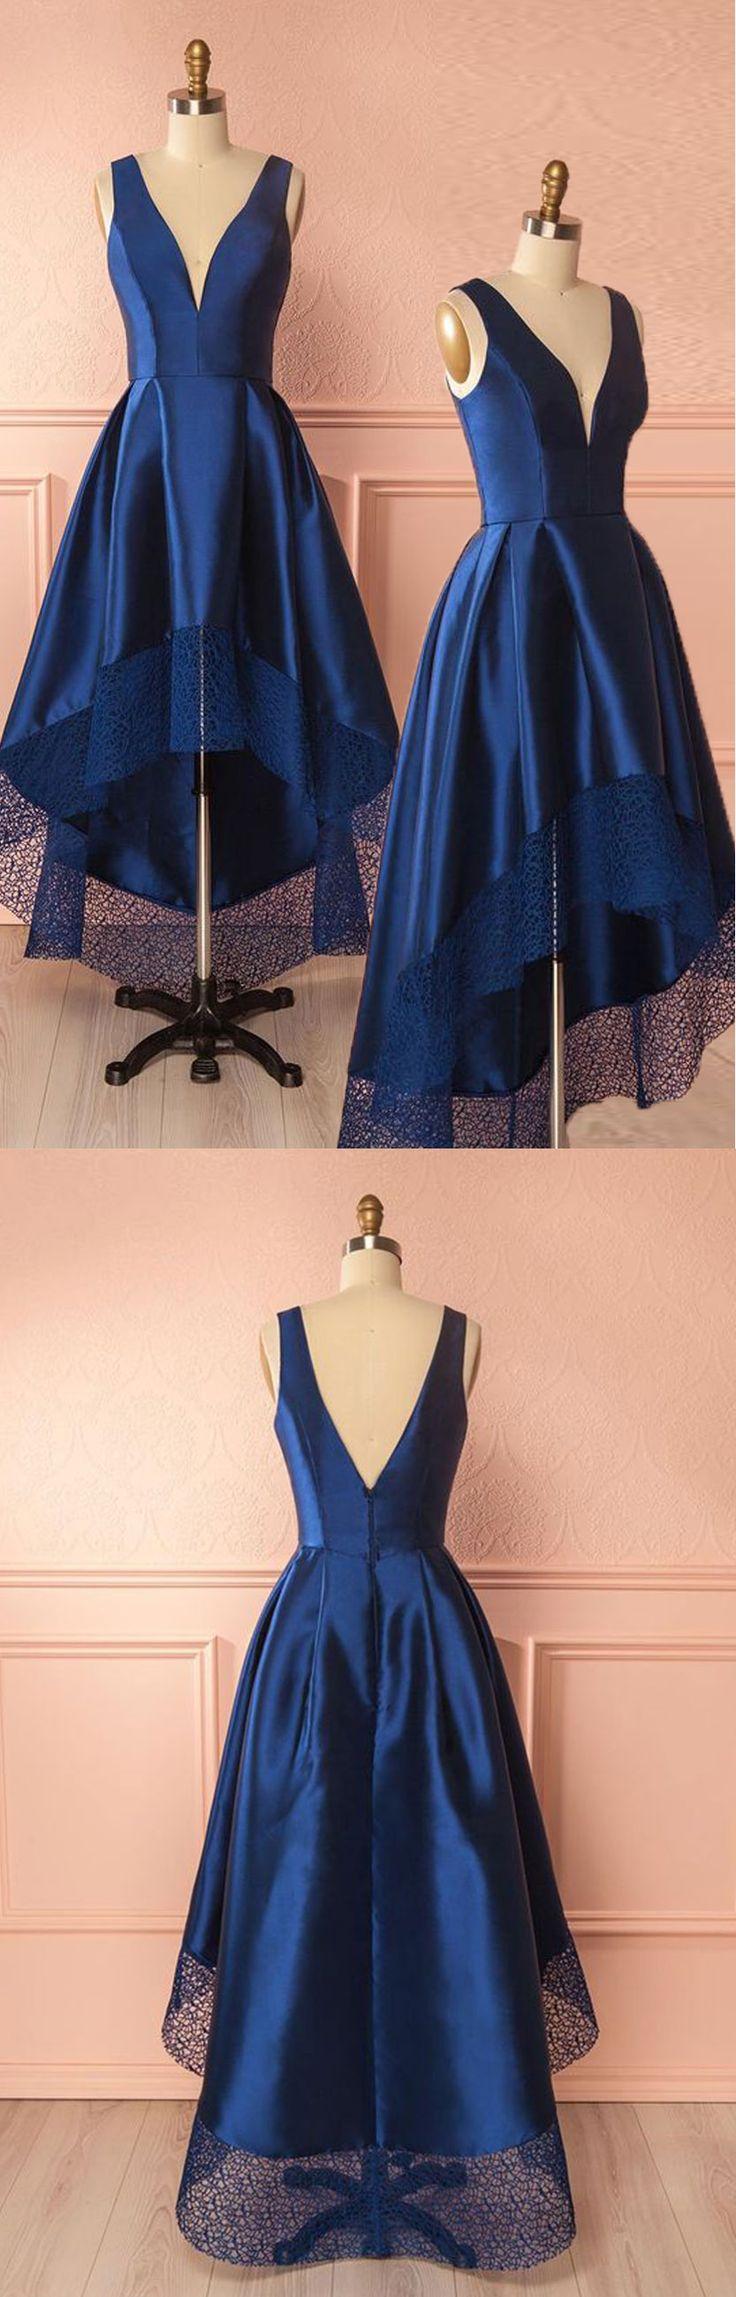 Dark blue v neck high low prom dress, dark blue bridesmaid dress, dark blue homecoming dress